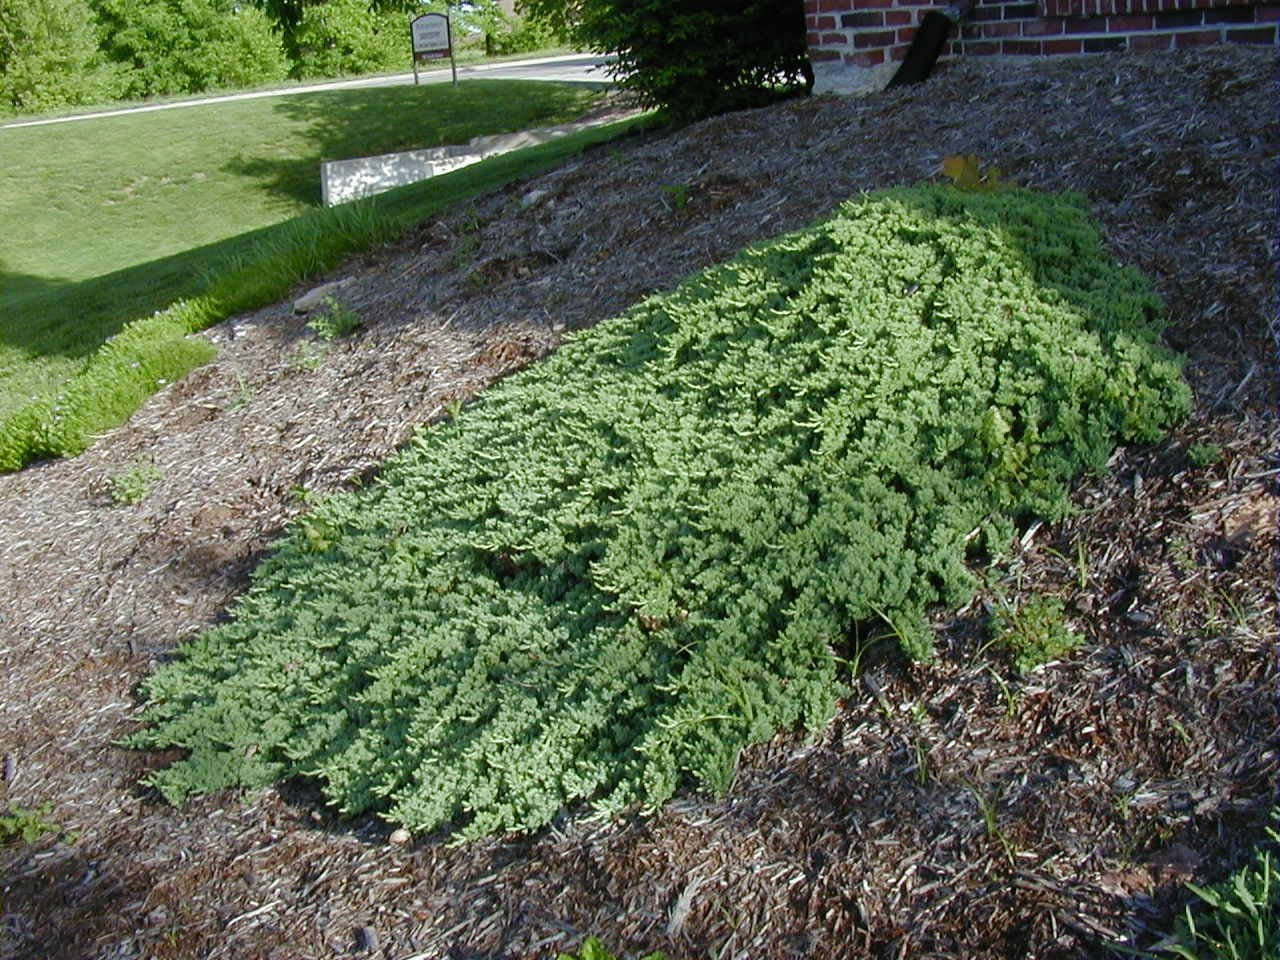 Juniper Procumbens Nana Qty 60 Live Plants Groundcover by Florida Foliage (Image #4)